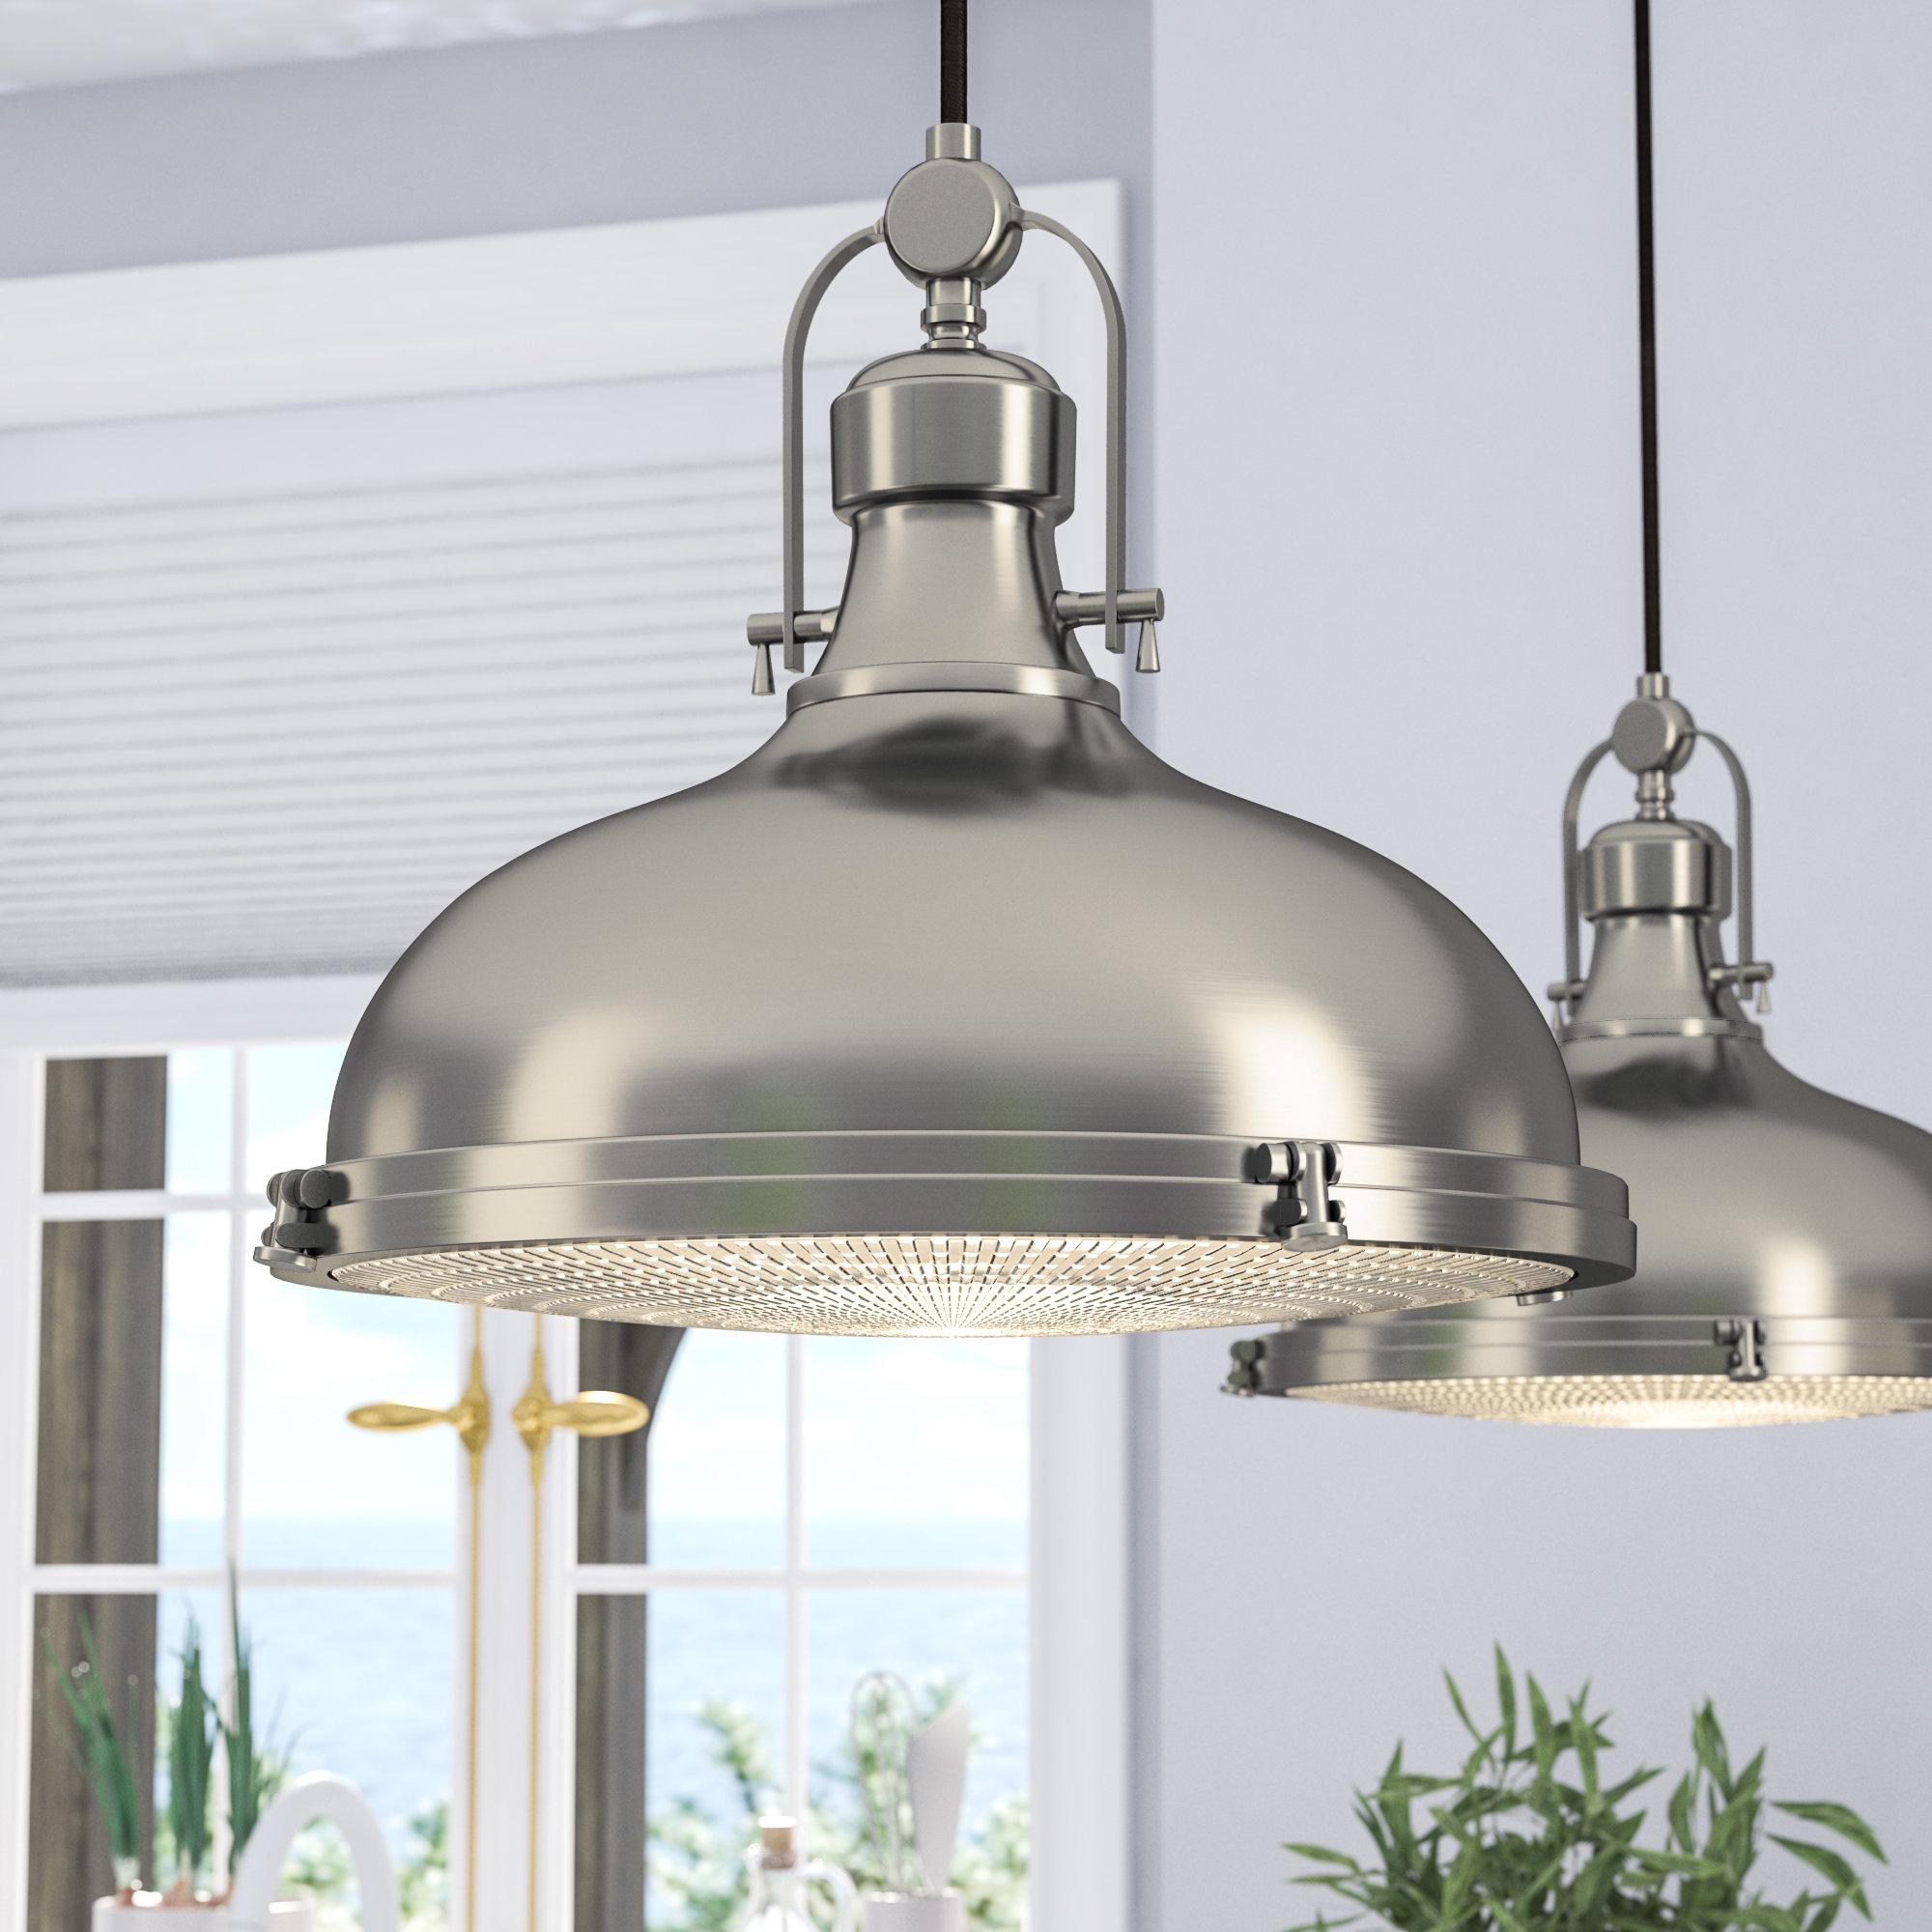 Attles 1 Light Dome Pendant – Inspirational Lighting Design within Macon 1-Light Single Dome Pendants (Image 8 of 30)